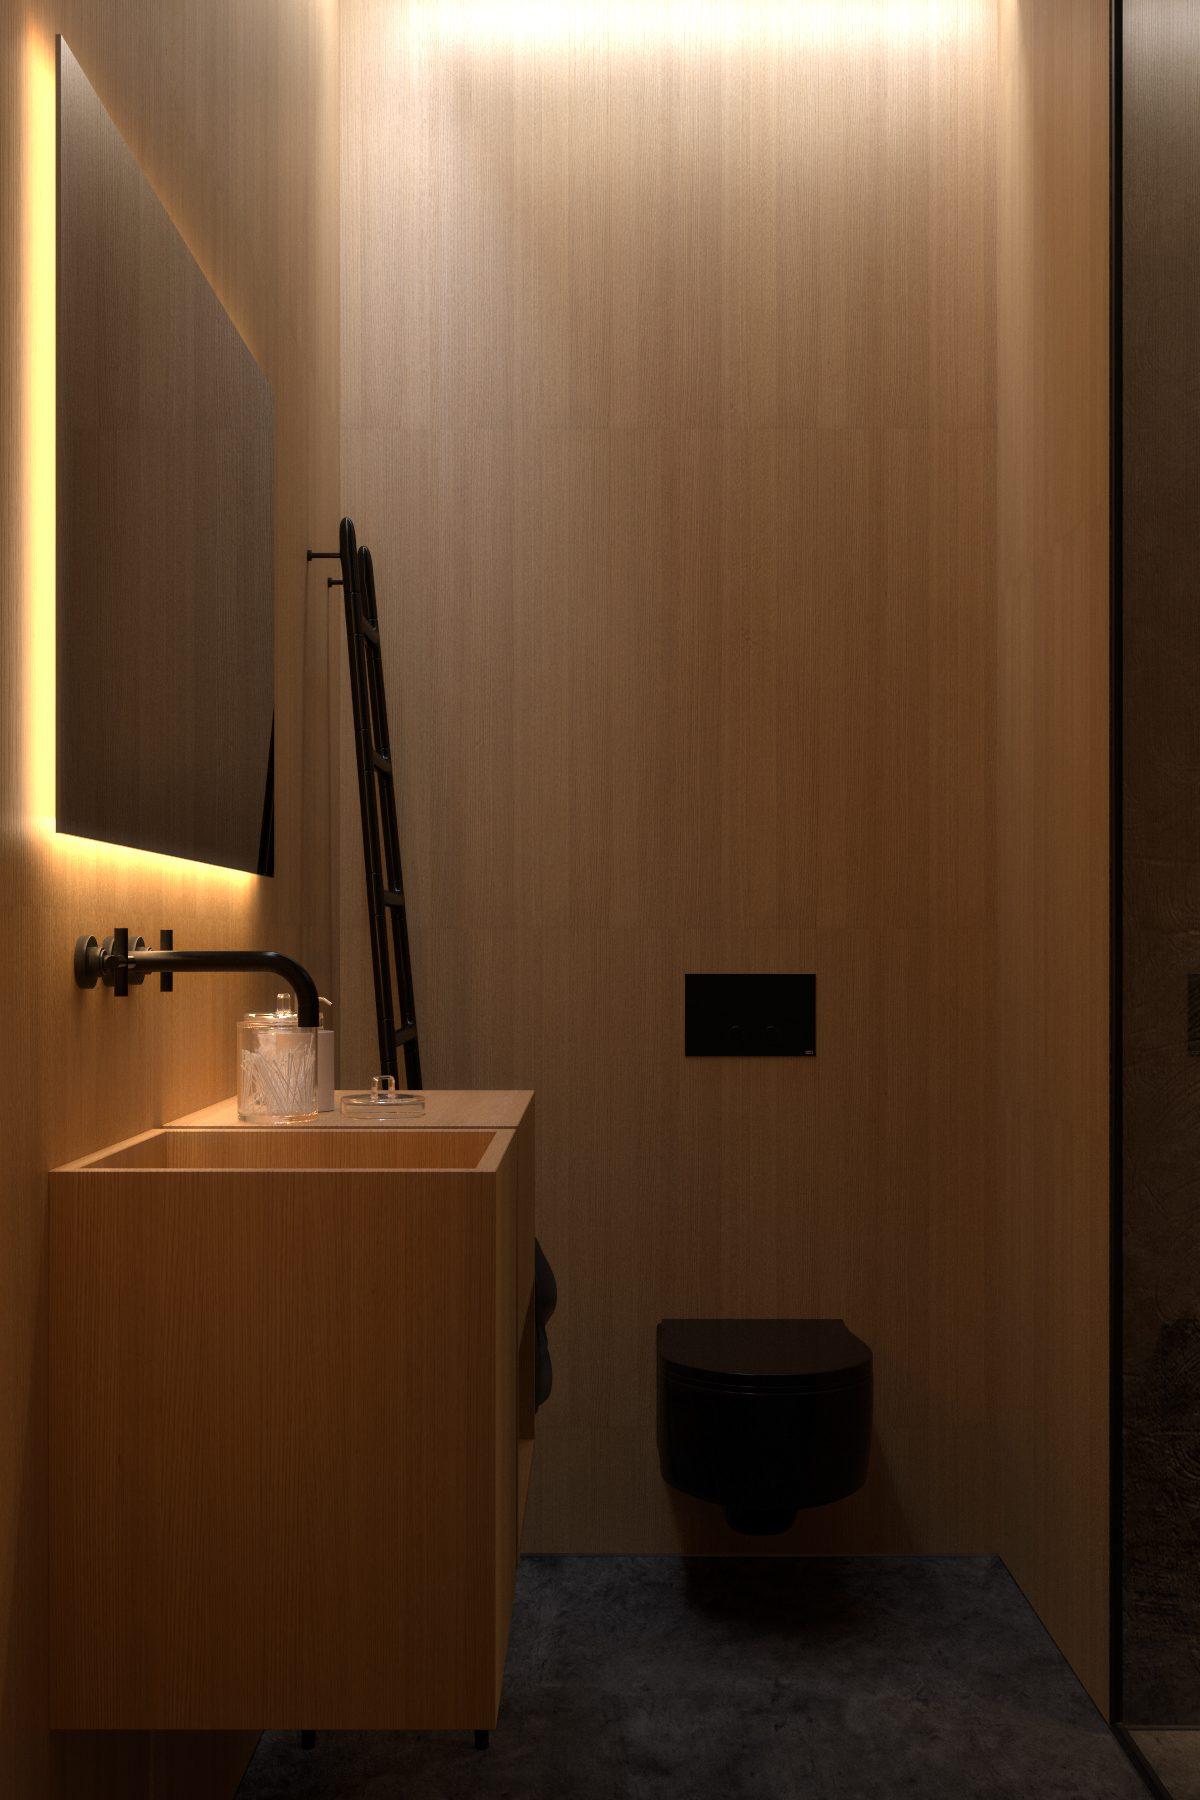 Dark bathroom interior style